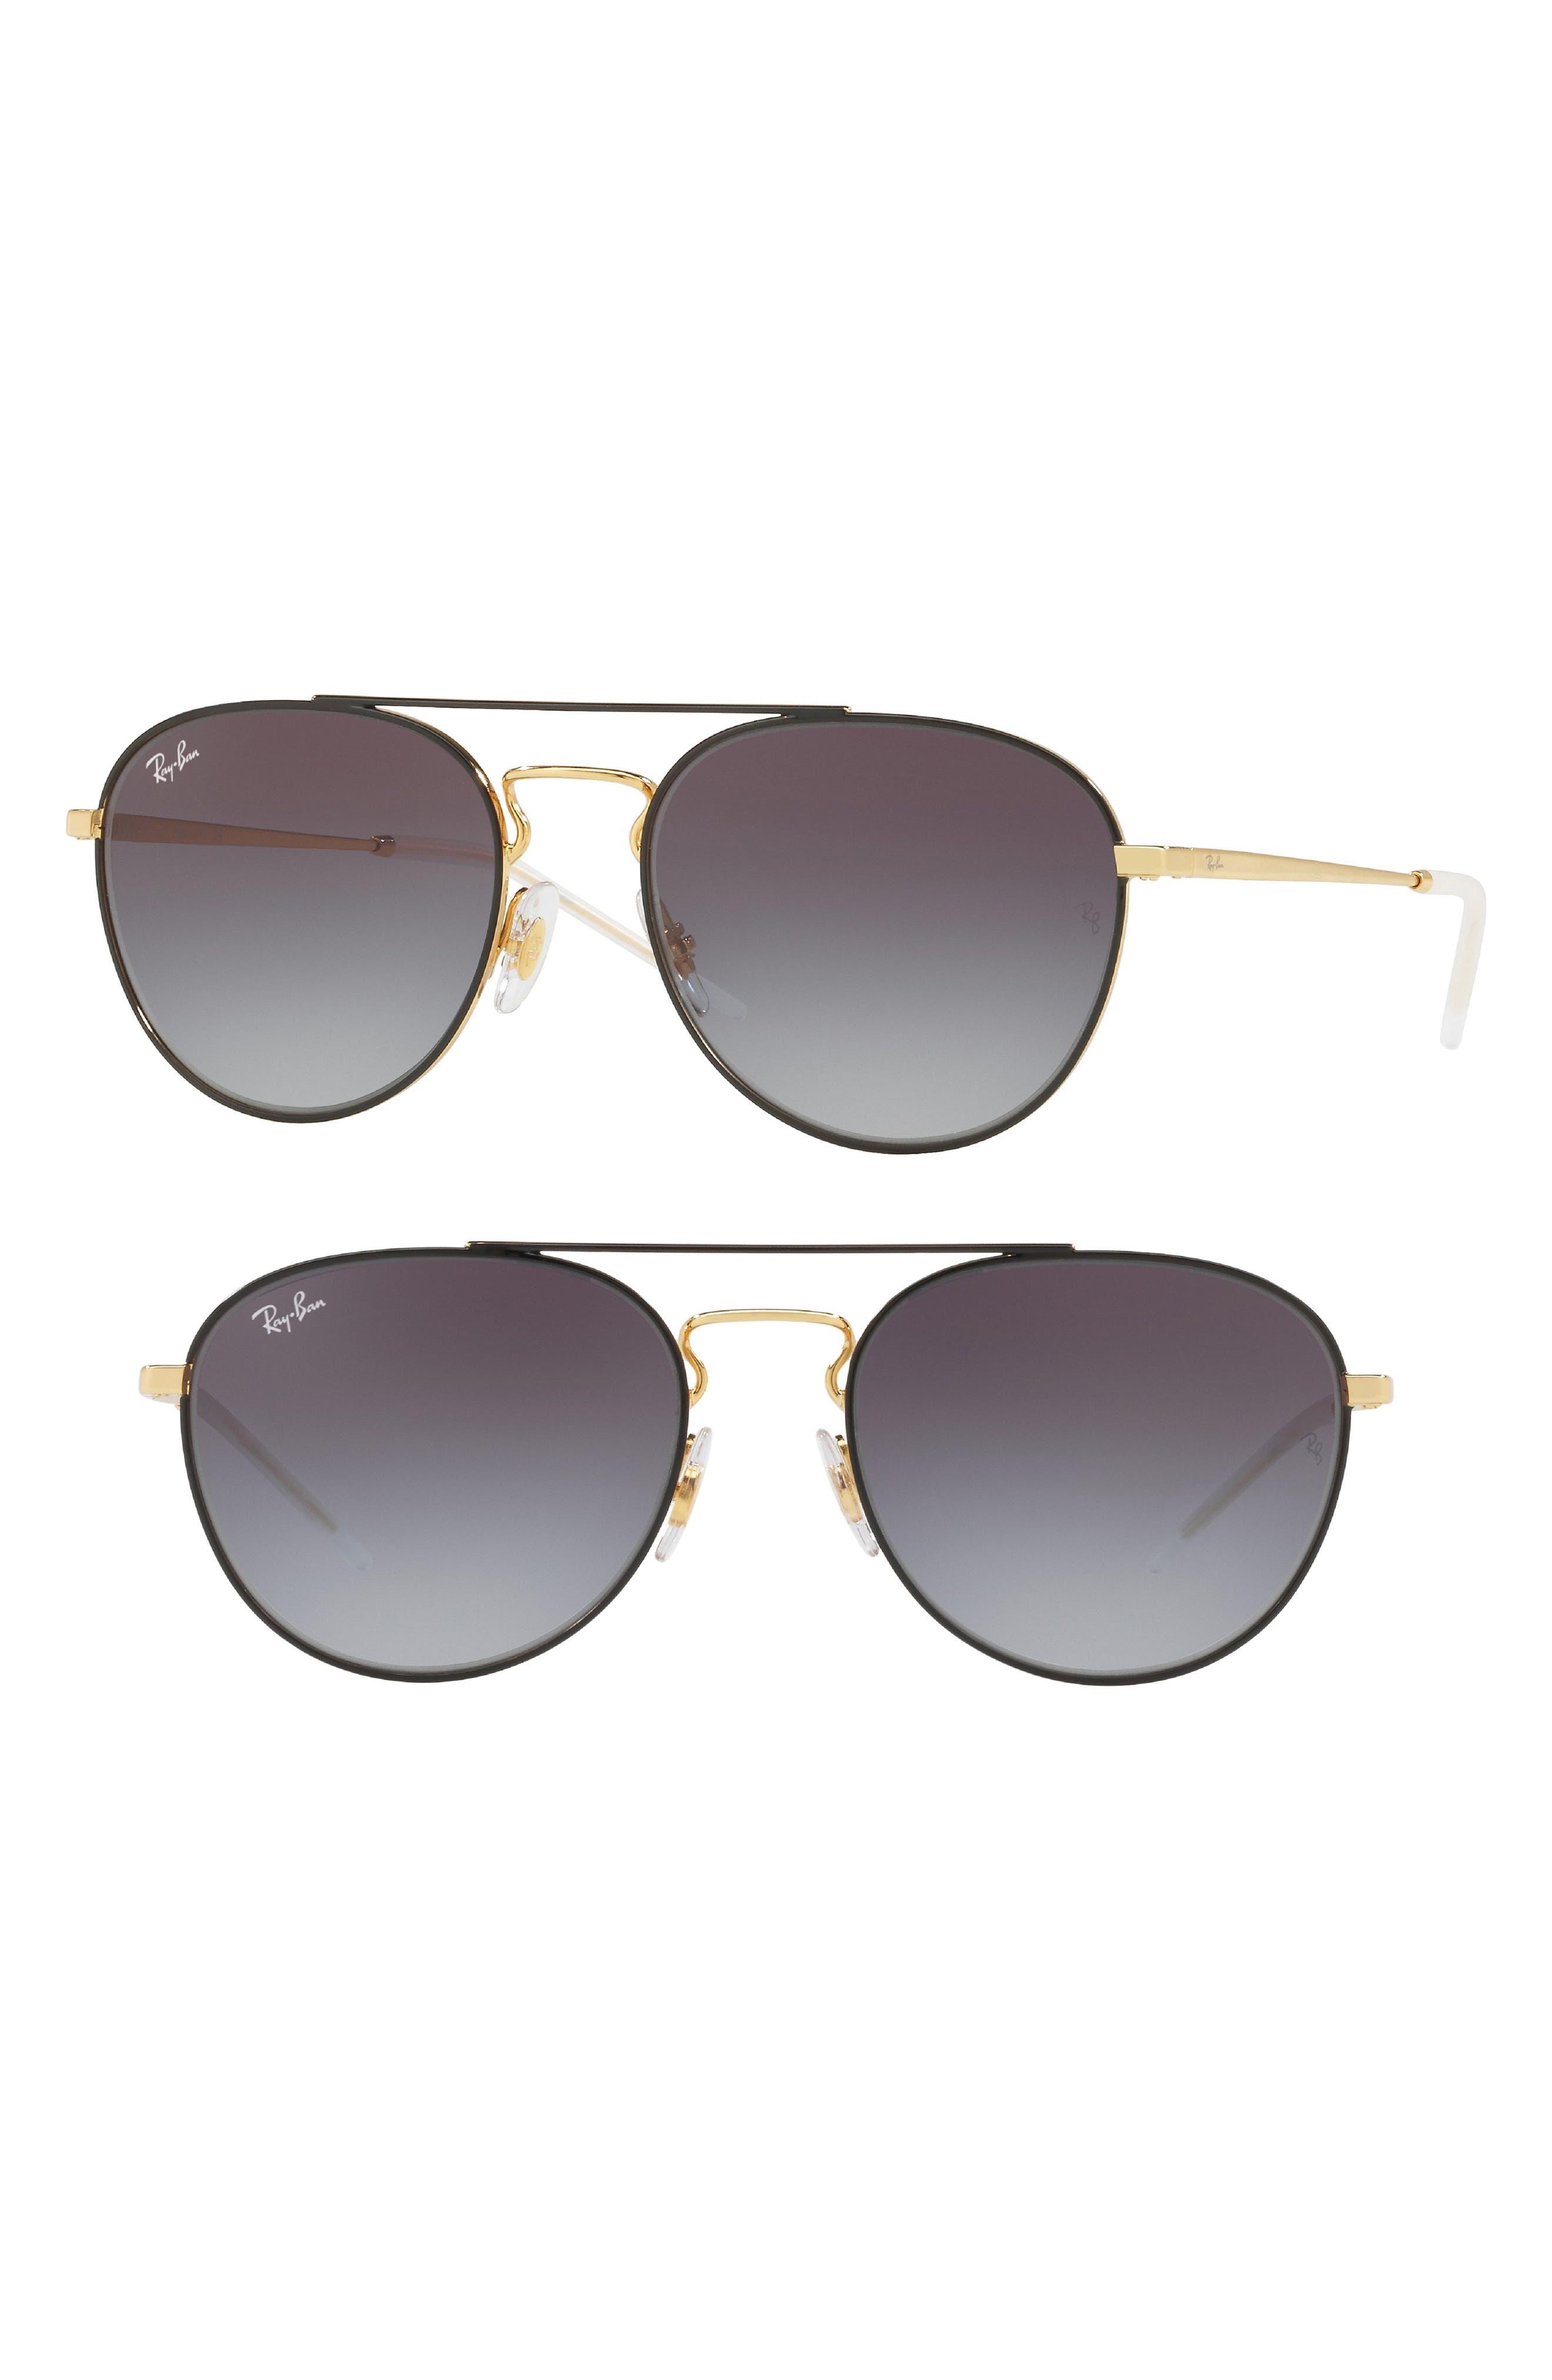 55mm Gradient Lens Round Aviator Sunglasses,                         Main,                         color, 001